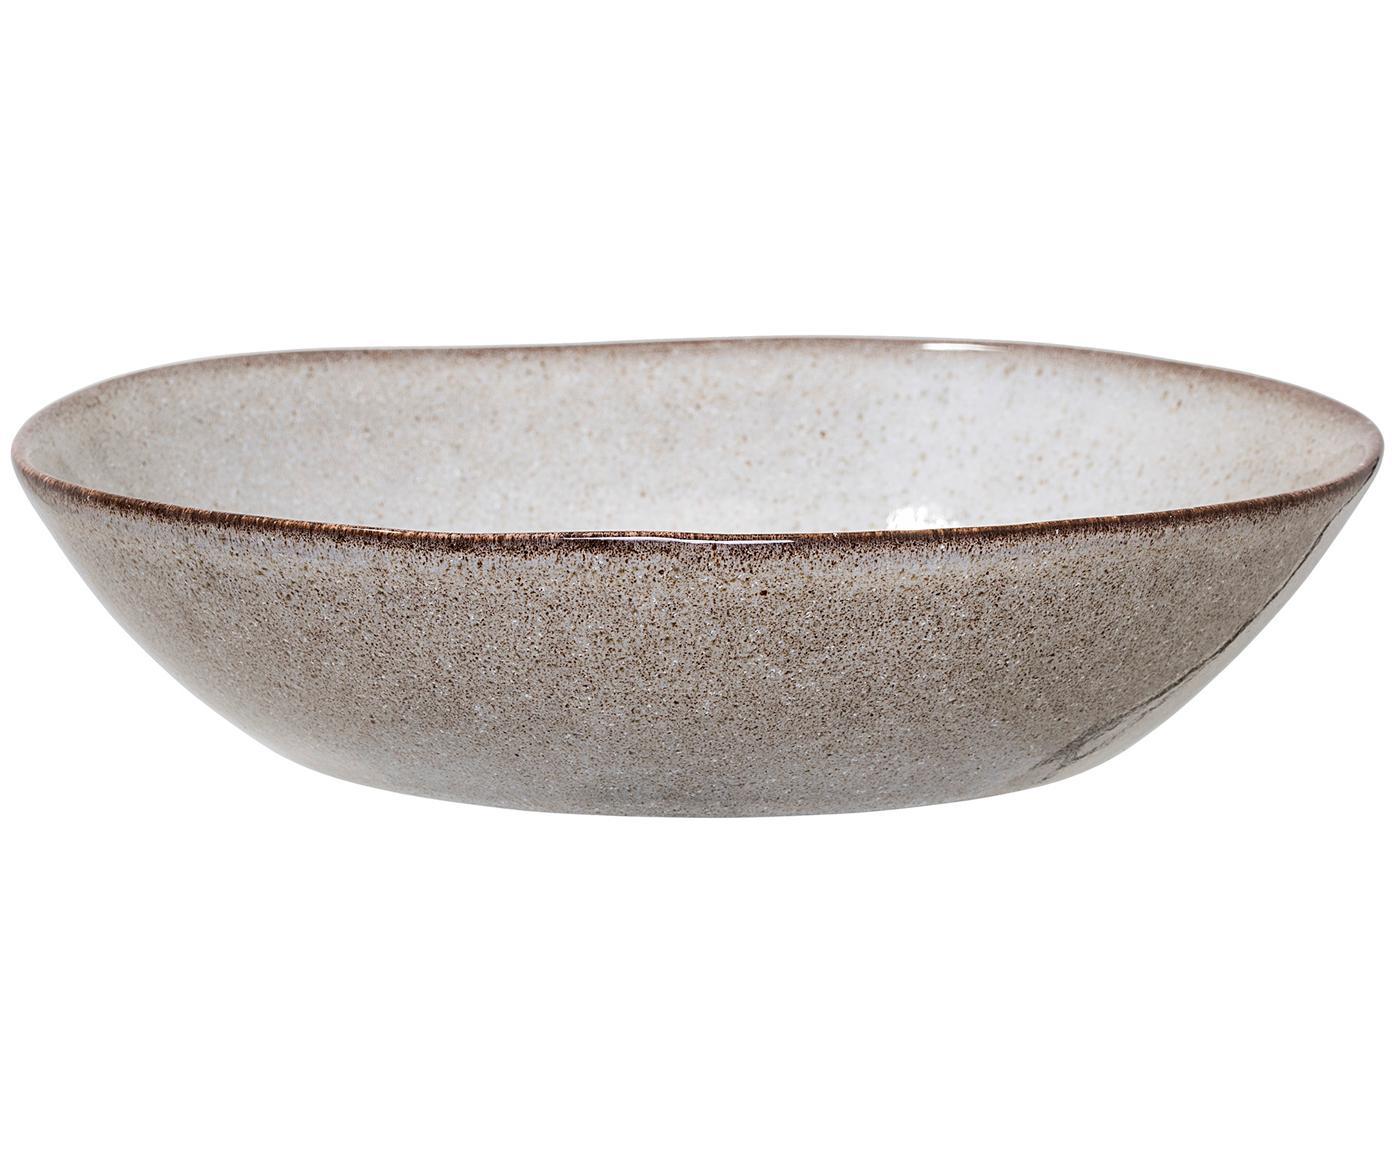 Ciotola fatta a mano beige Sandrine, Ceramica, Tonalità beige, Ø 22 x Alt. 5 cm